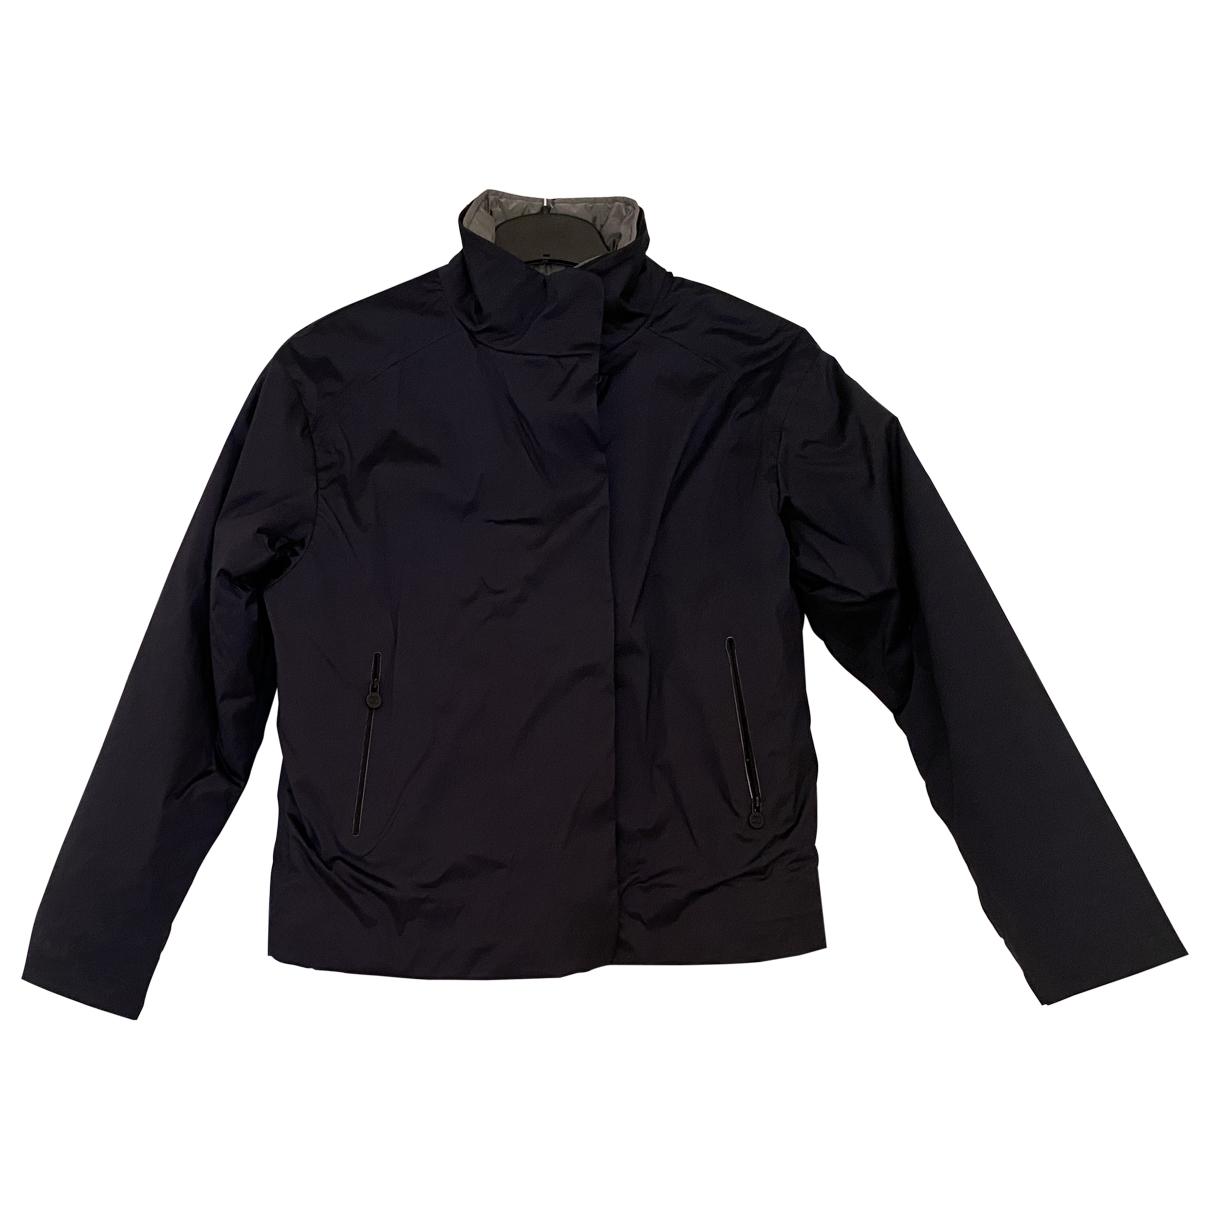 Chanel \N Navy jacket for Women 36 FR